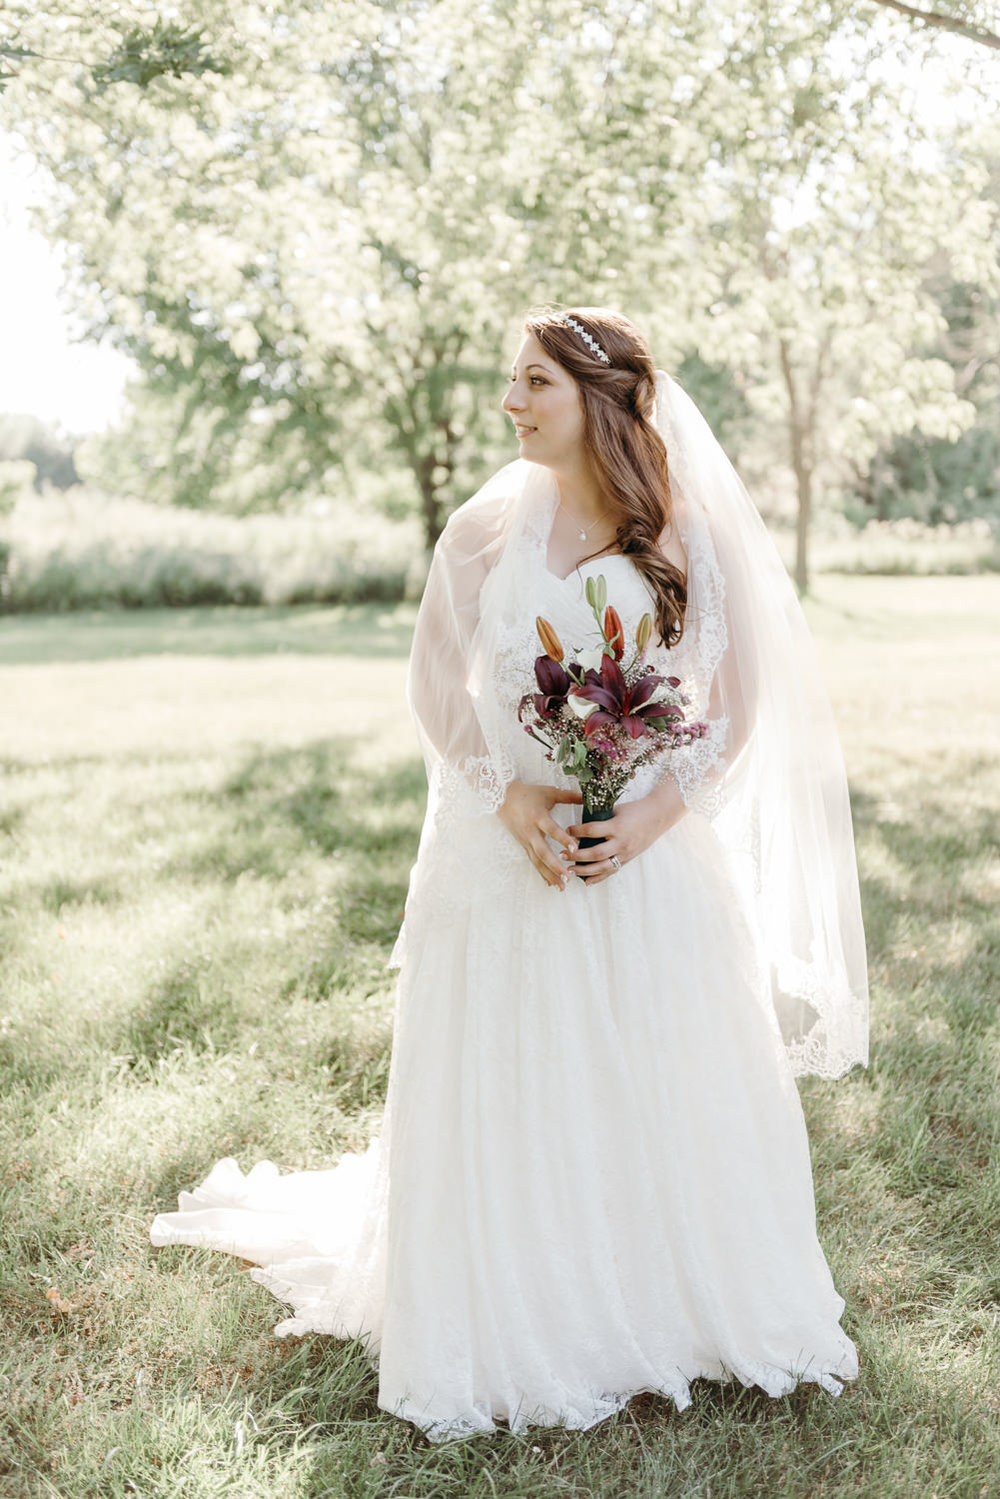 Grant Beachy wedding photographer goshen elkhart south bend chicago-044.jpg